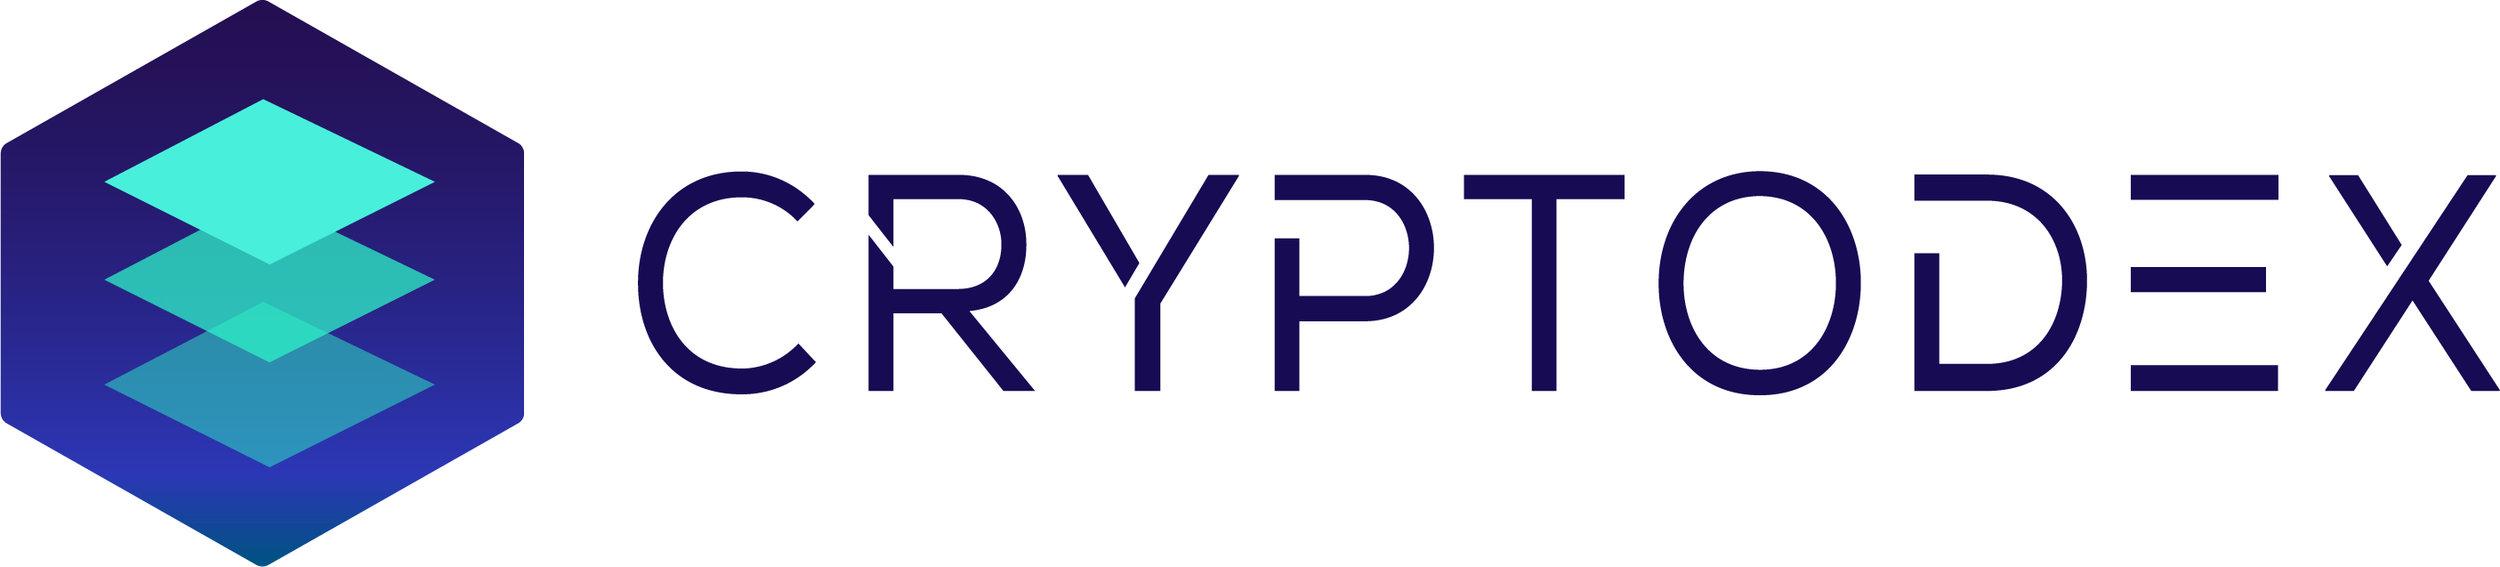 cryptodex-logo-horizontal@4x-100 (1).jpg